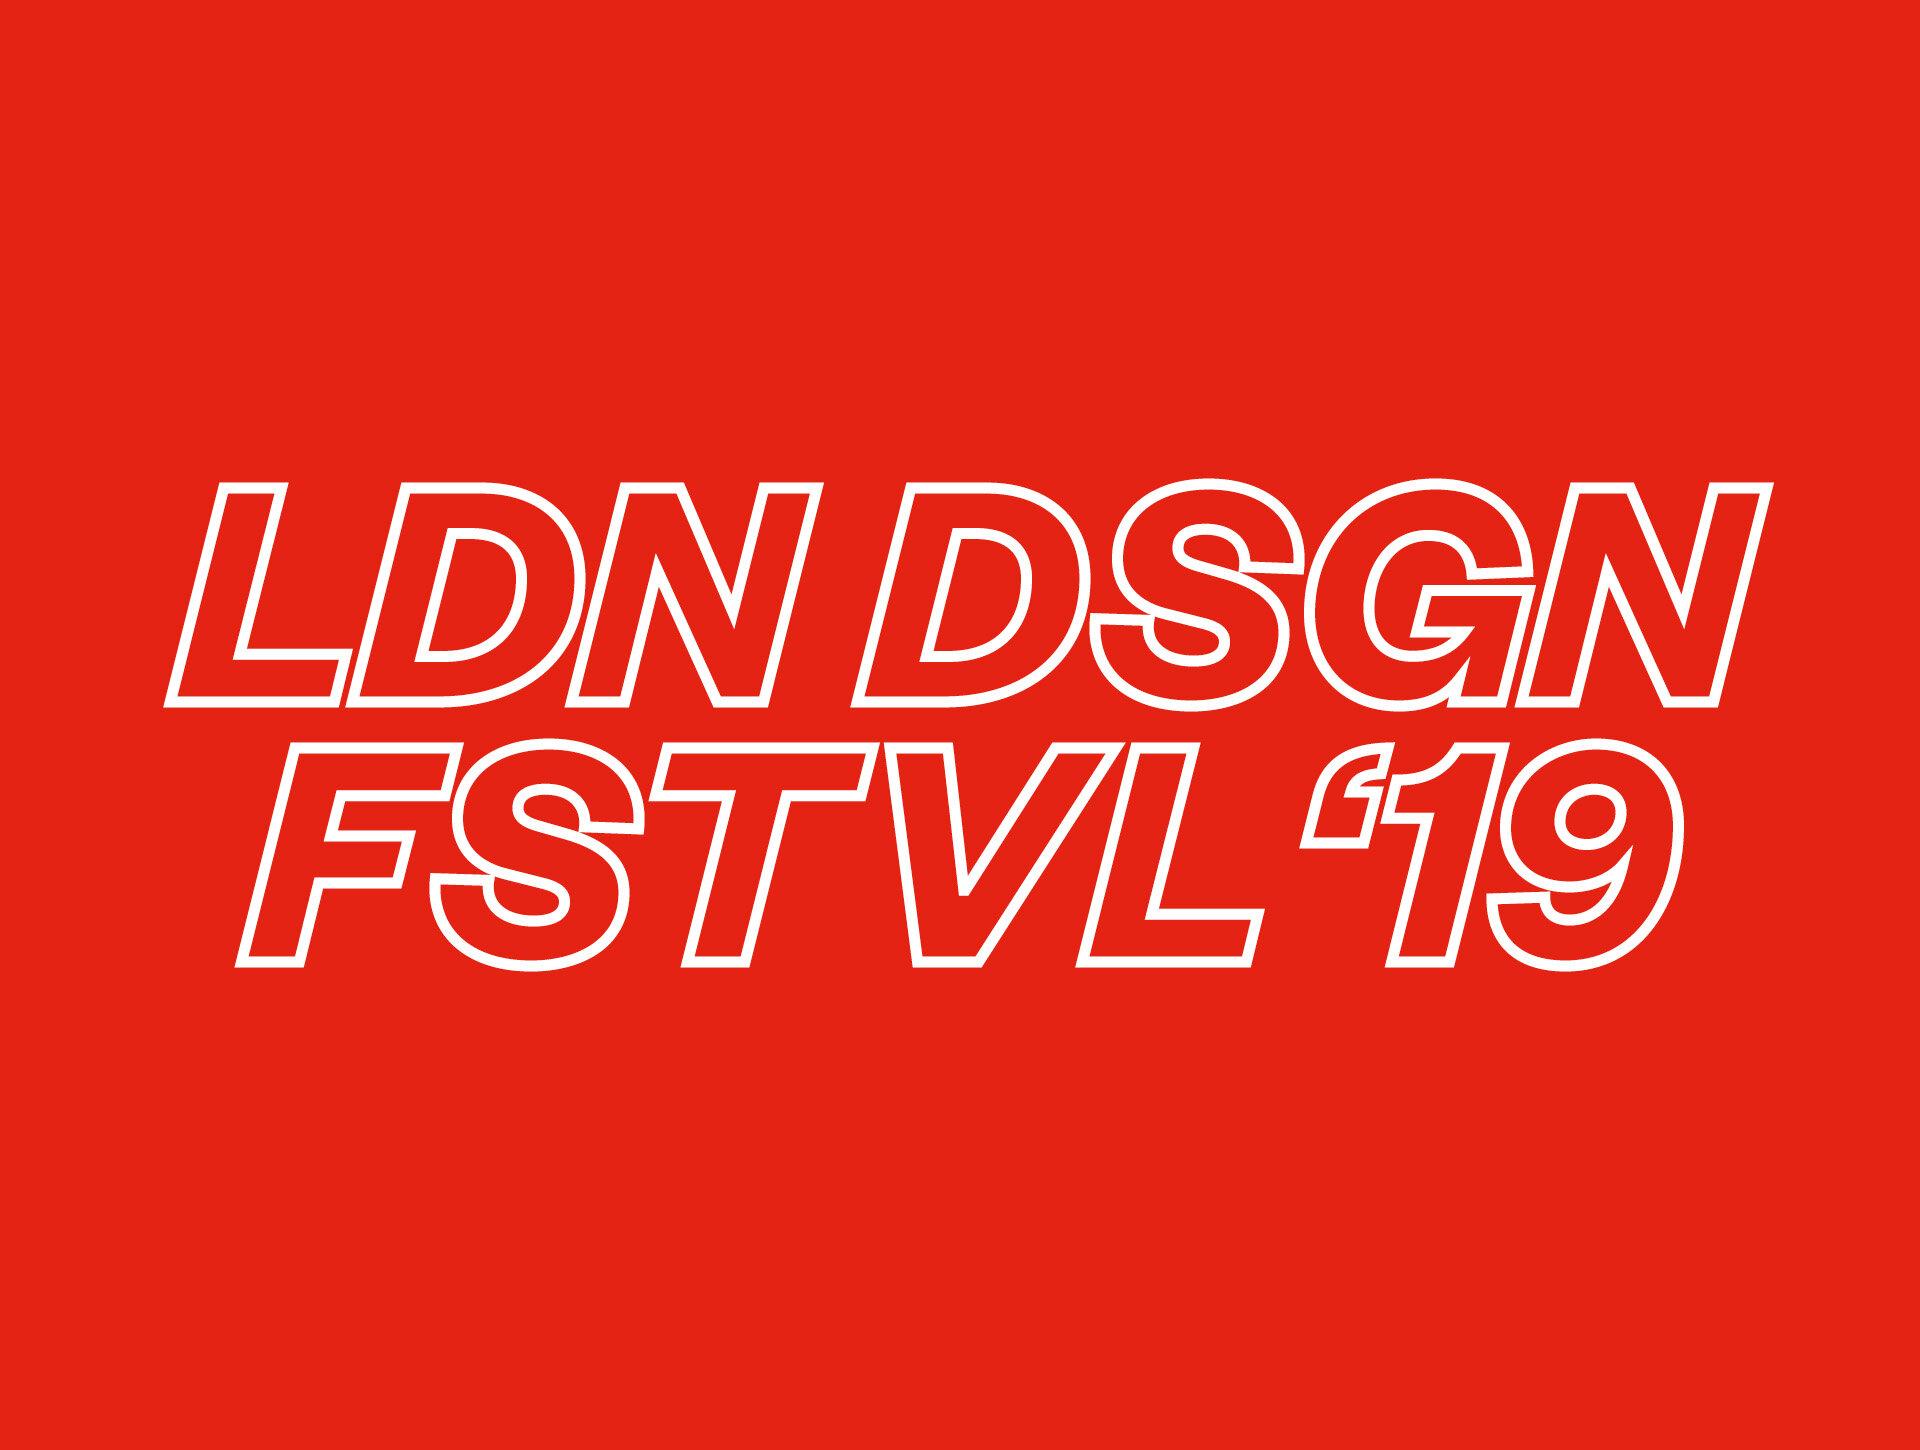 london-design-week-2019.jpg